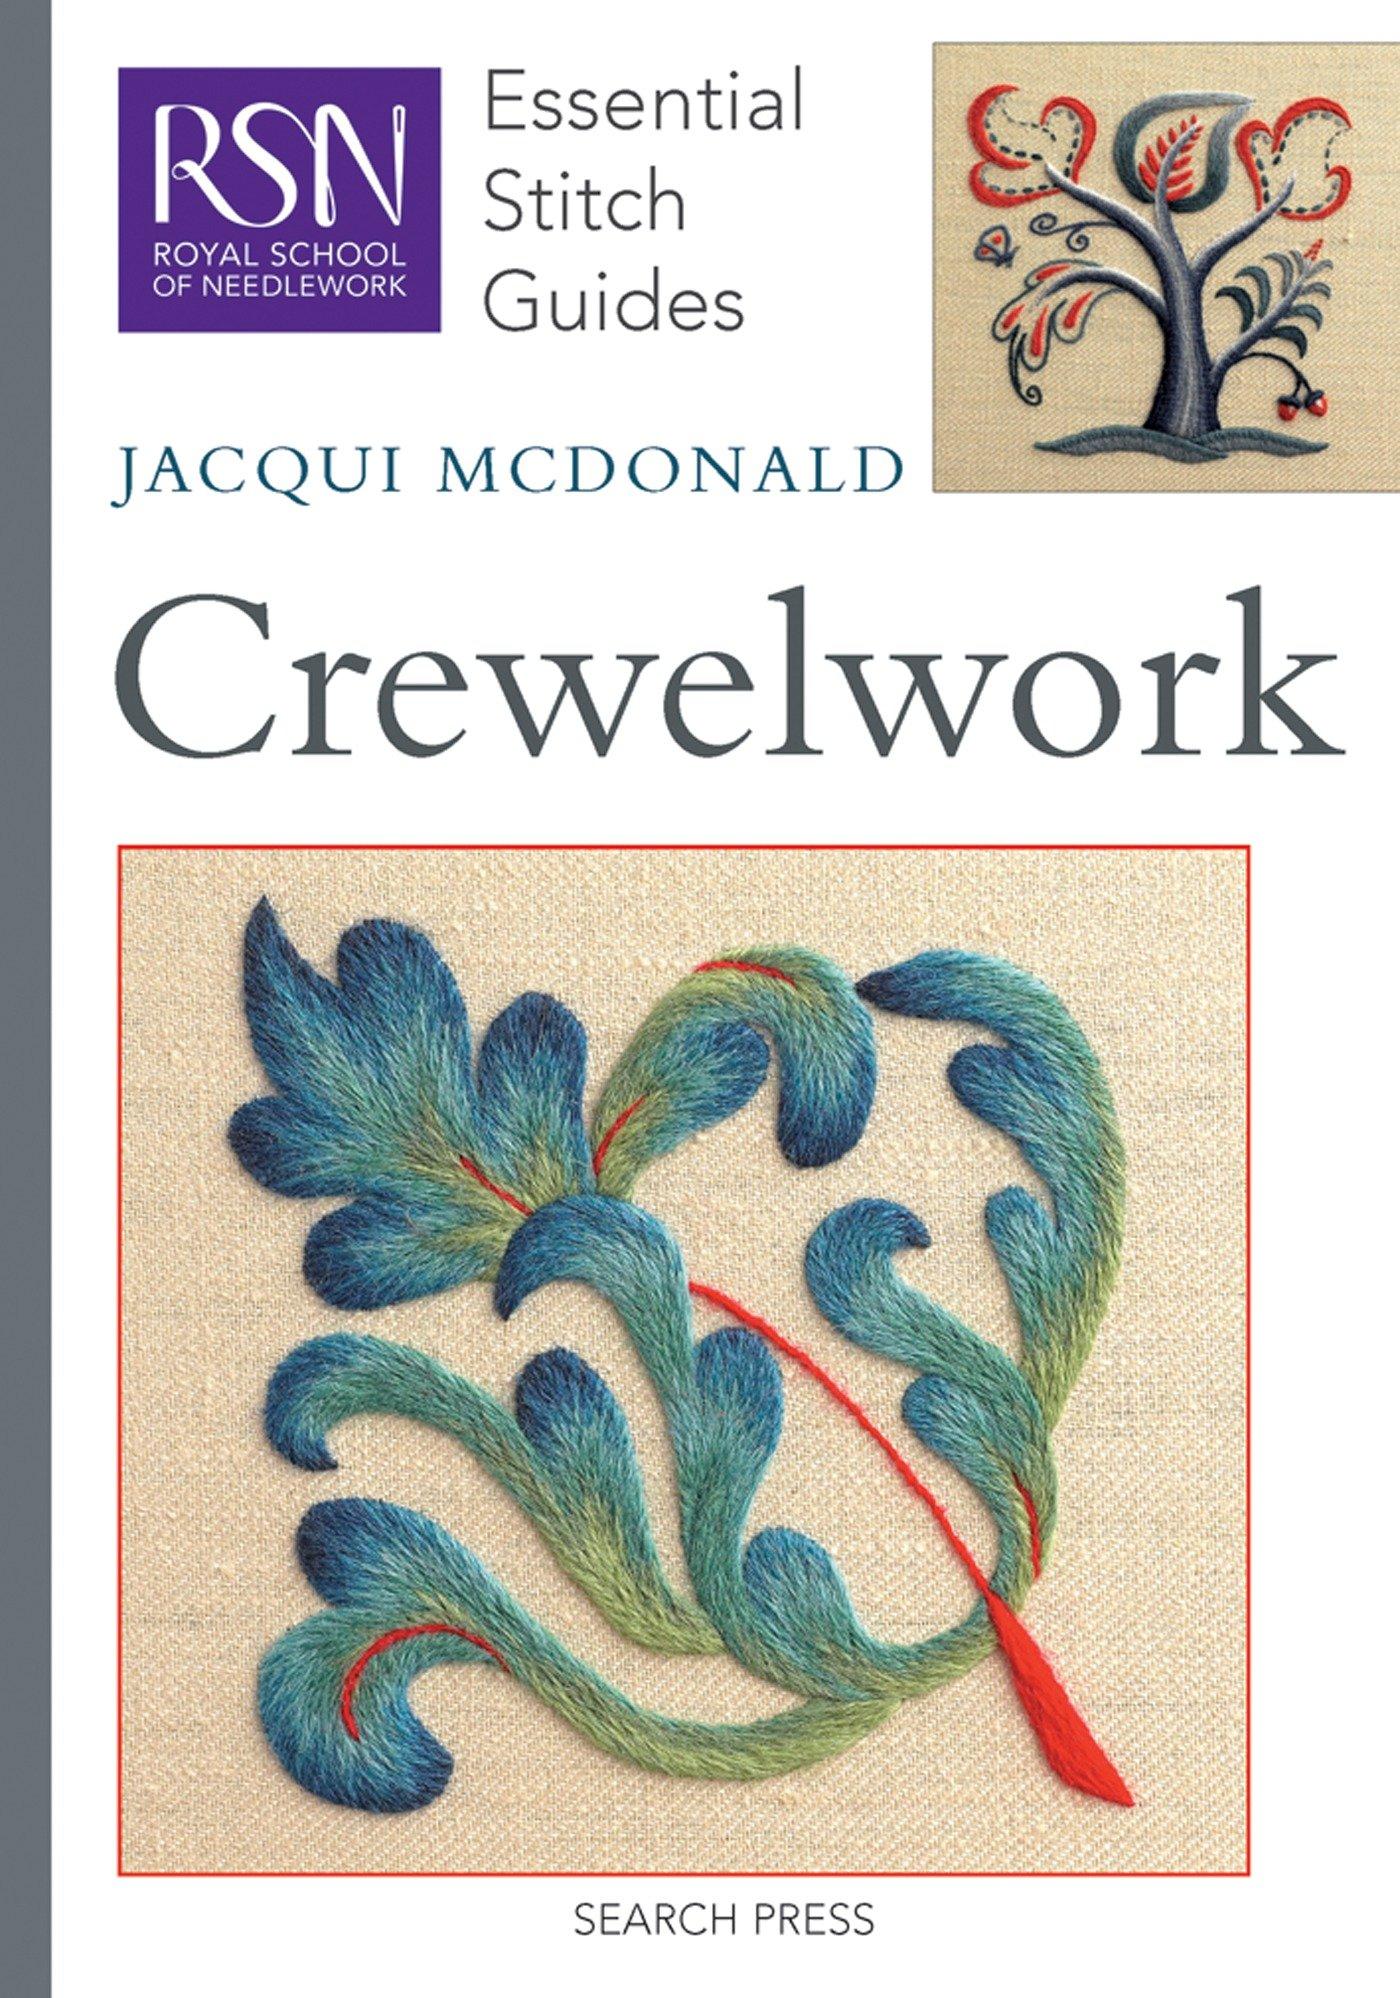 RSN ESG: Crewelwork: Essential Stitch Guides (Royal School of Needlework Essential Stitch Guides)